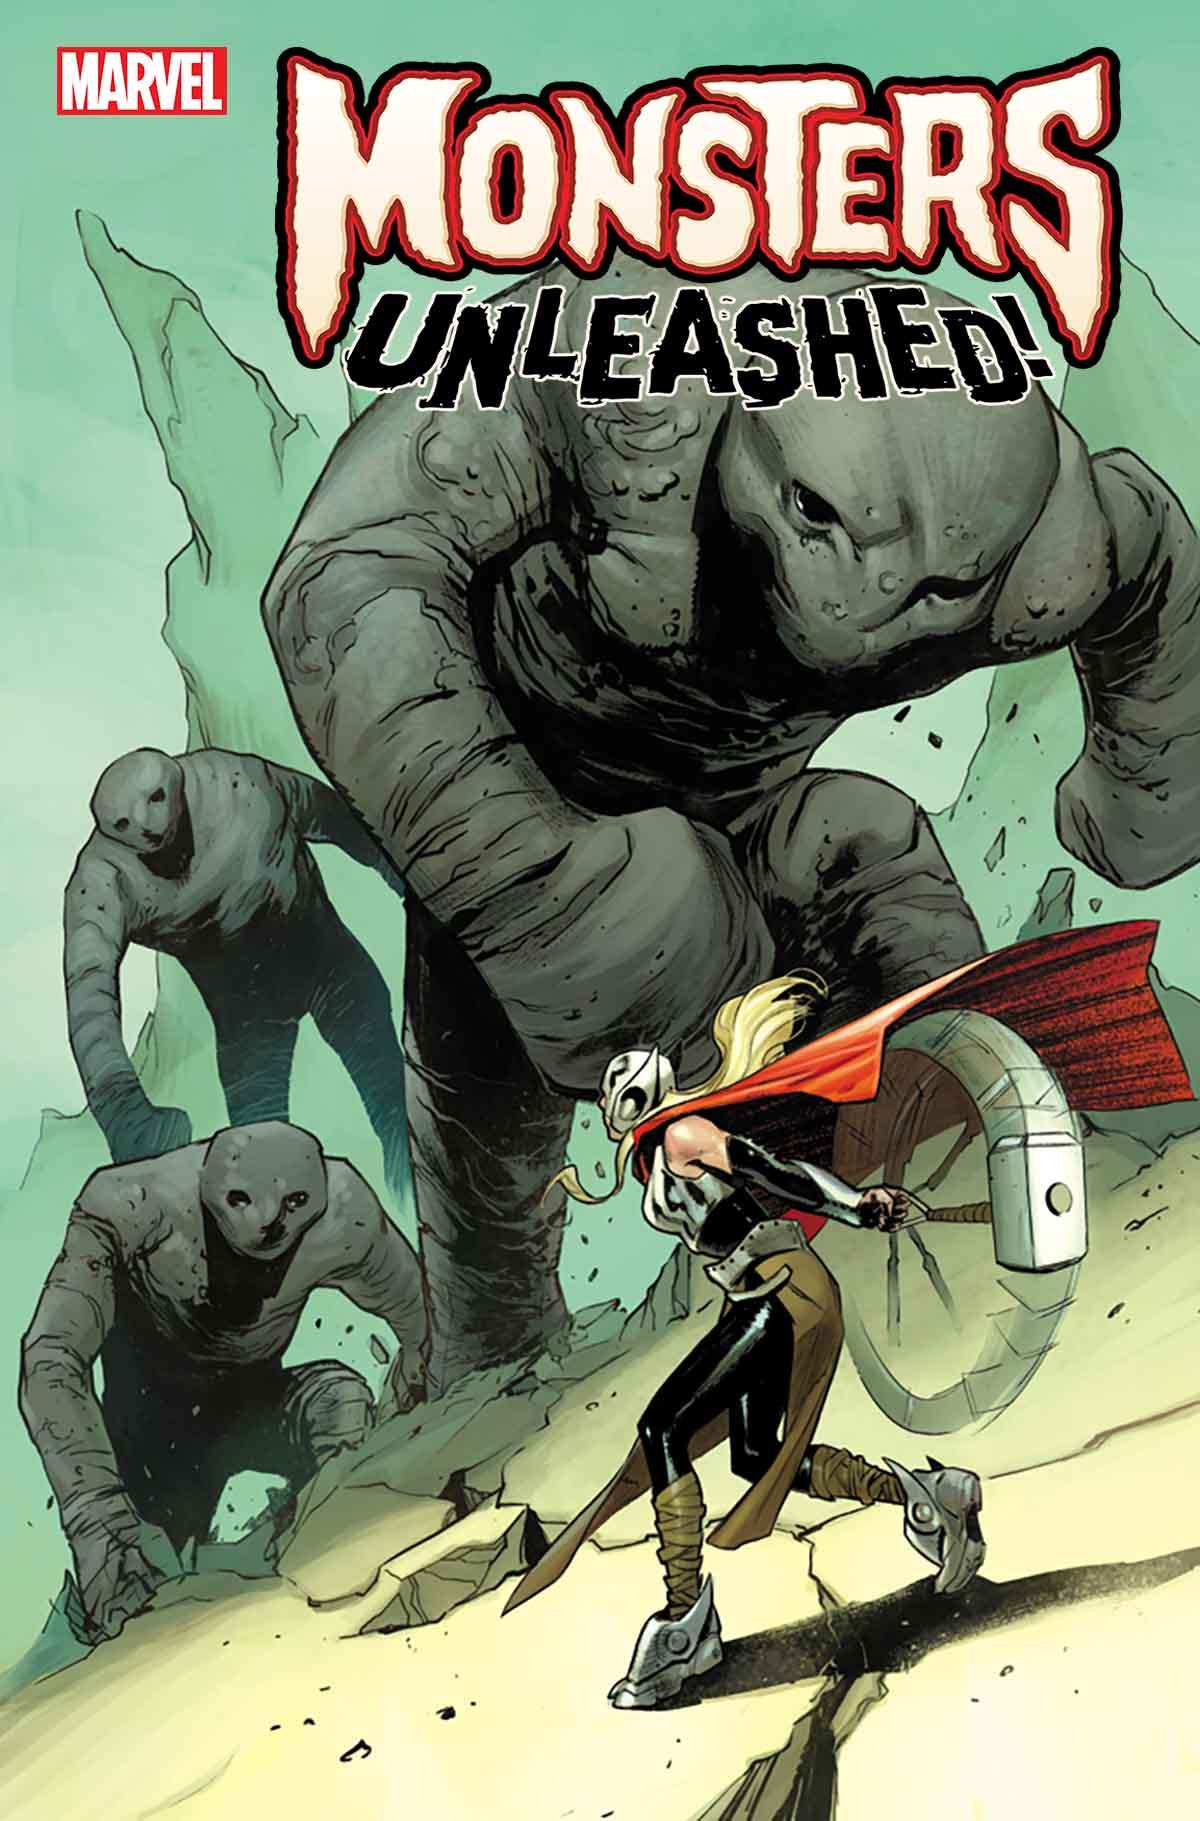 marvel-reveals-monsters-unleashed-variant-cover-art6